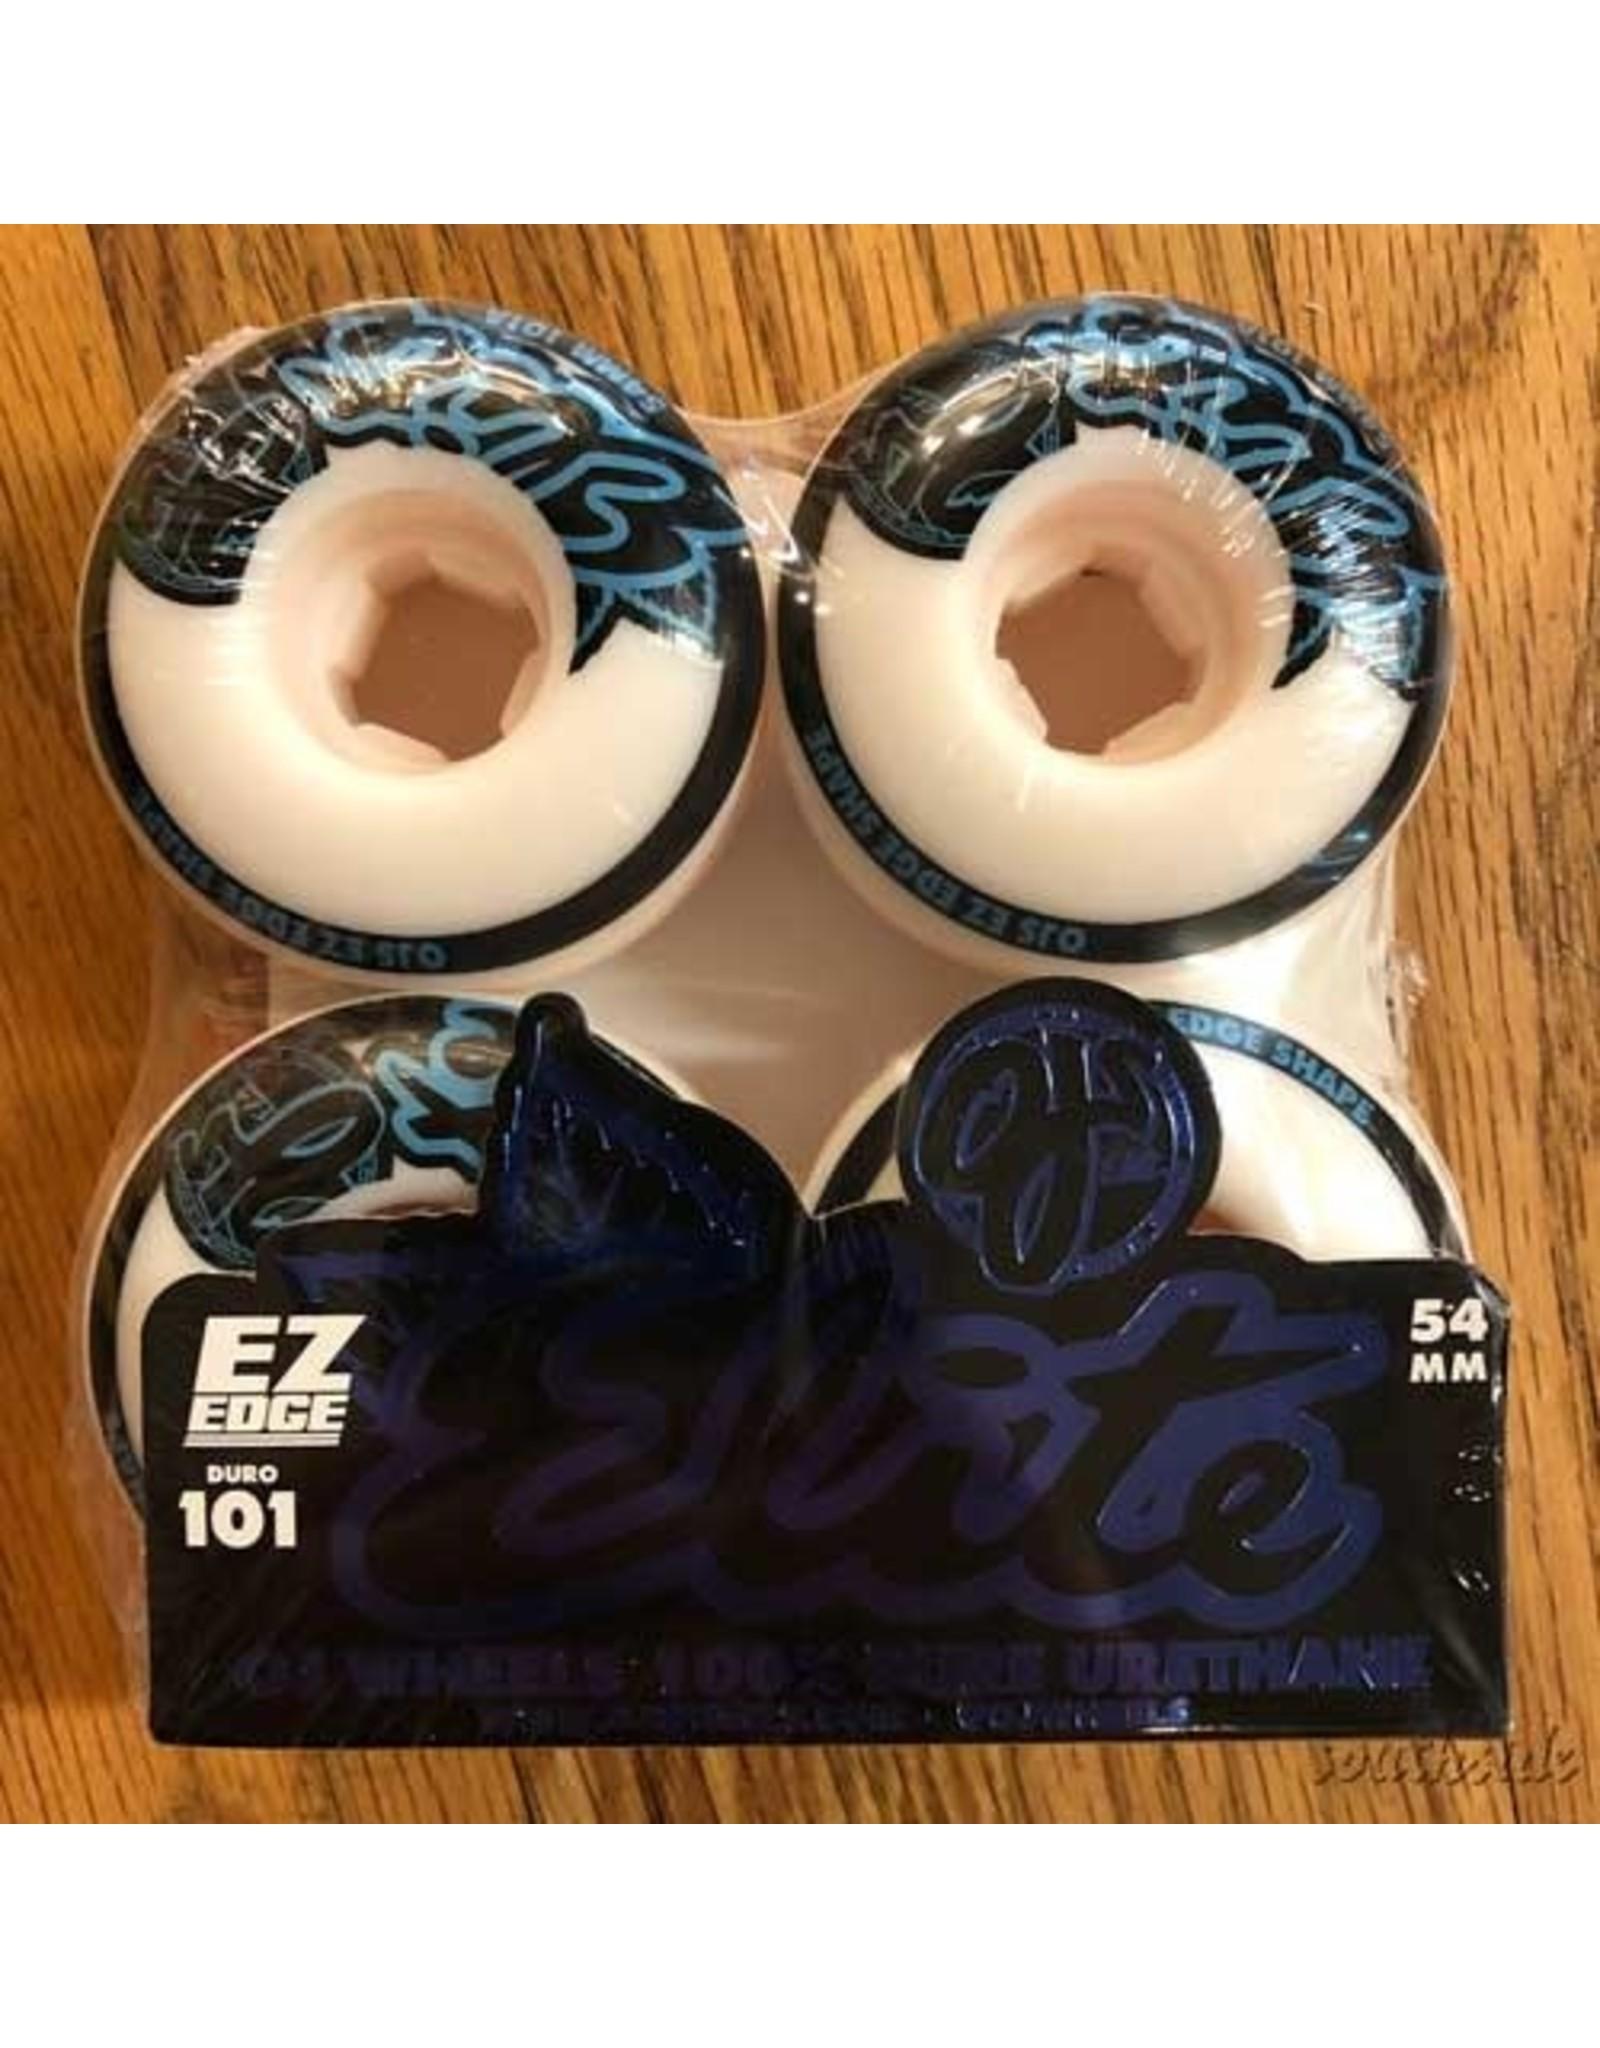 OJ Wheels Elite EZ Edge 54mm101A